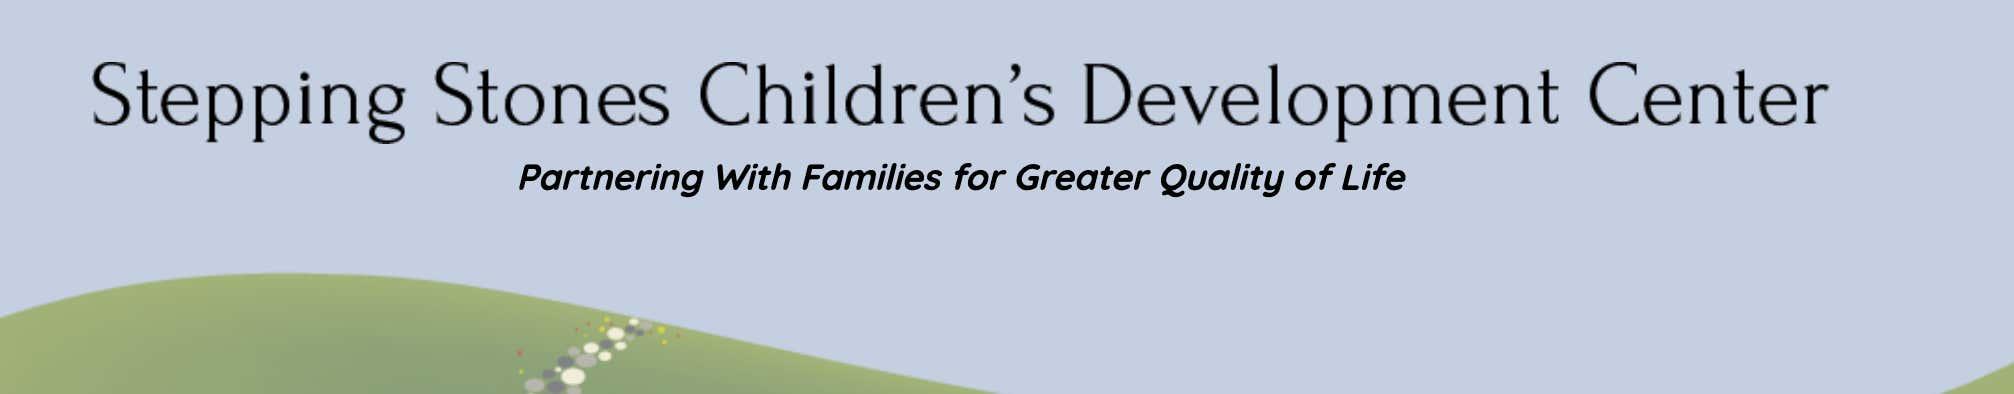 Stepping Stones Children's Development Center